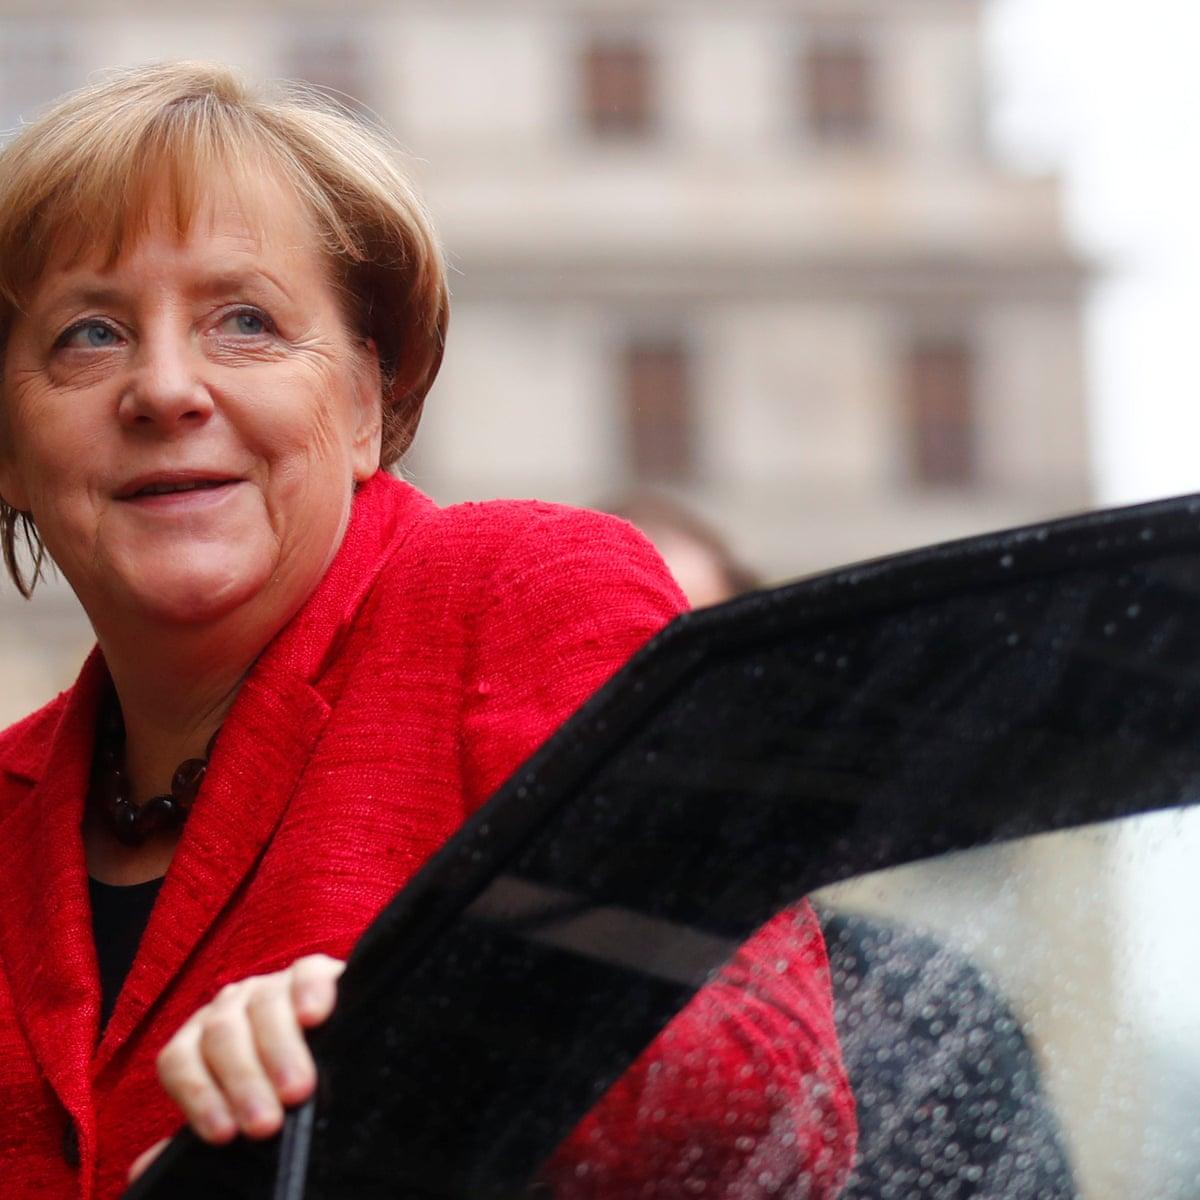 Angela Merkel Clings To Top Spot In Forbes 100 Most Powerful Women List Angela Merkel The Guardian